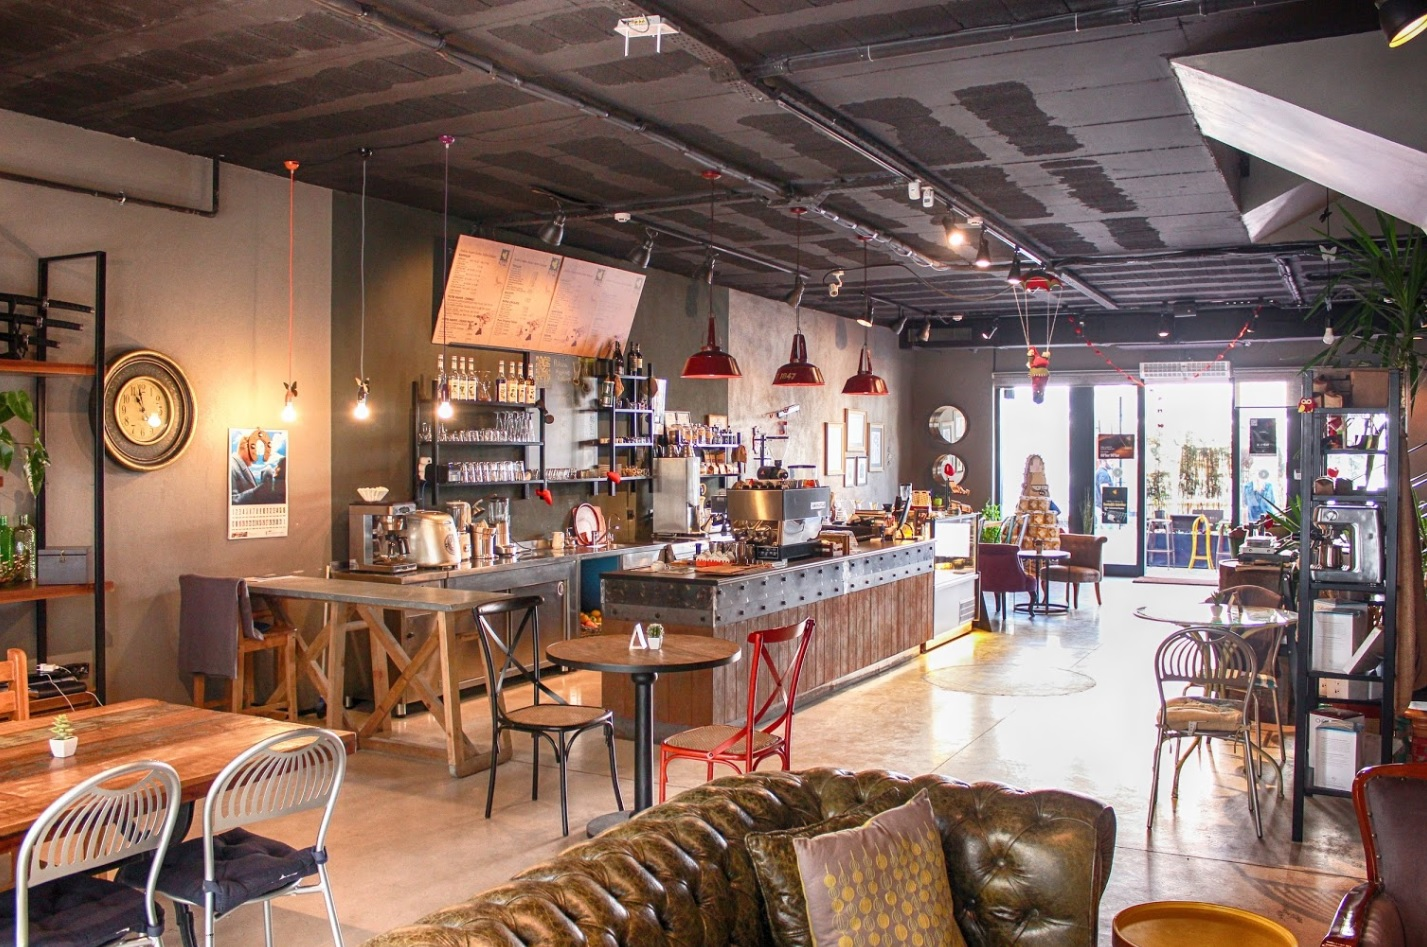 Kraz Cafe